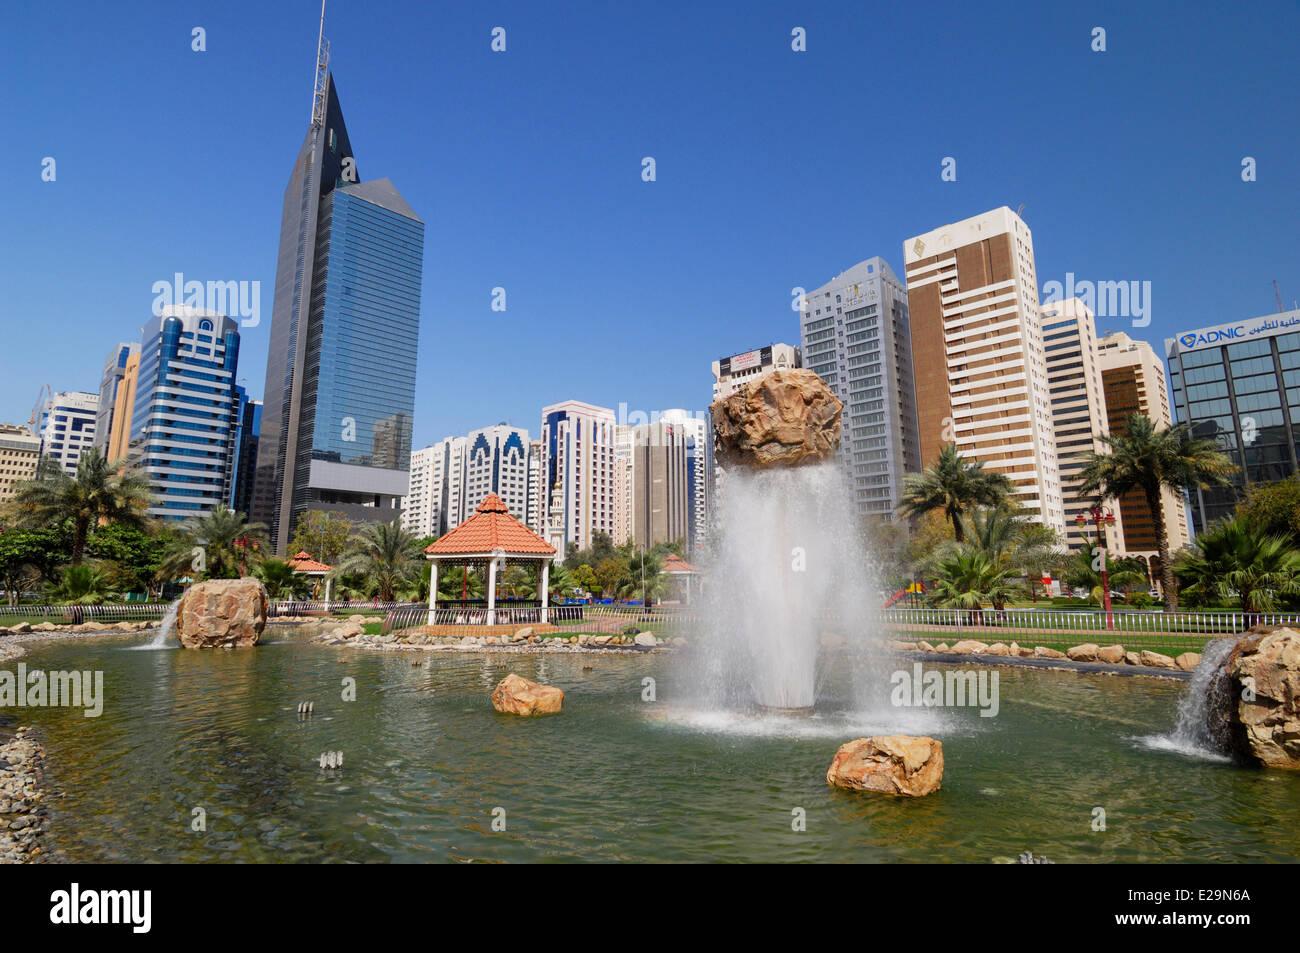 United Arab Emirates, Abu Dhabi emirate, Abu Dhabi city, fountains in the Capital Garden Park Stock Photo